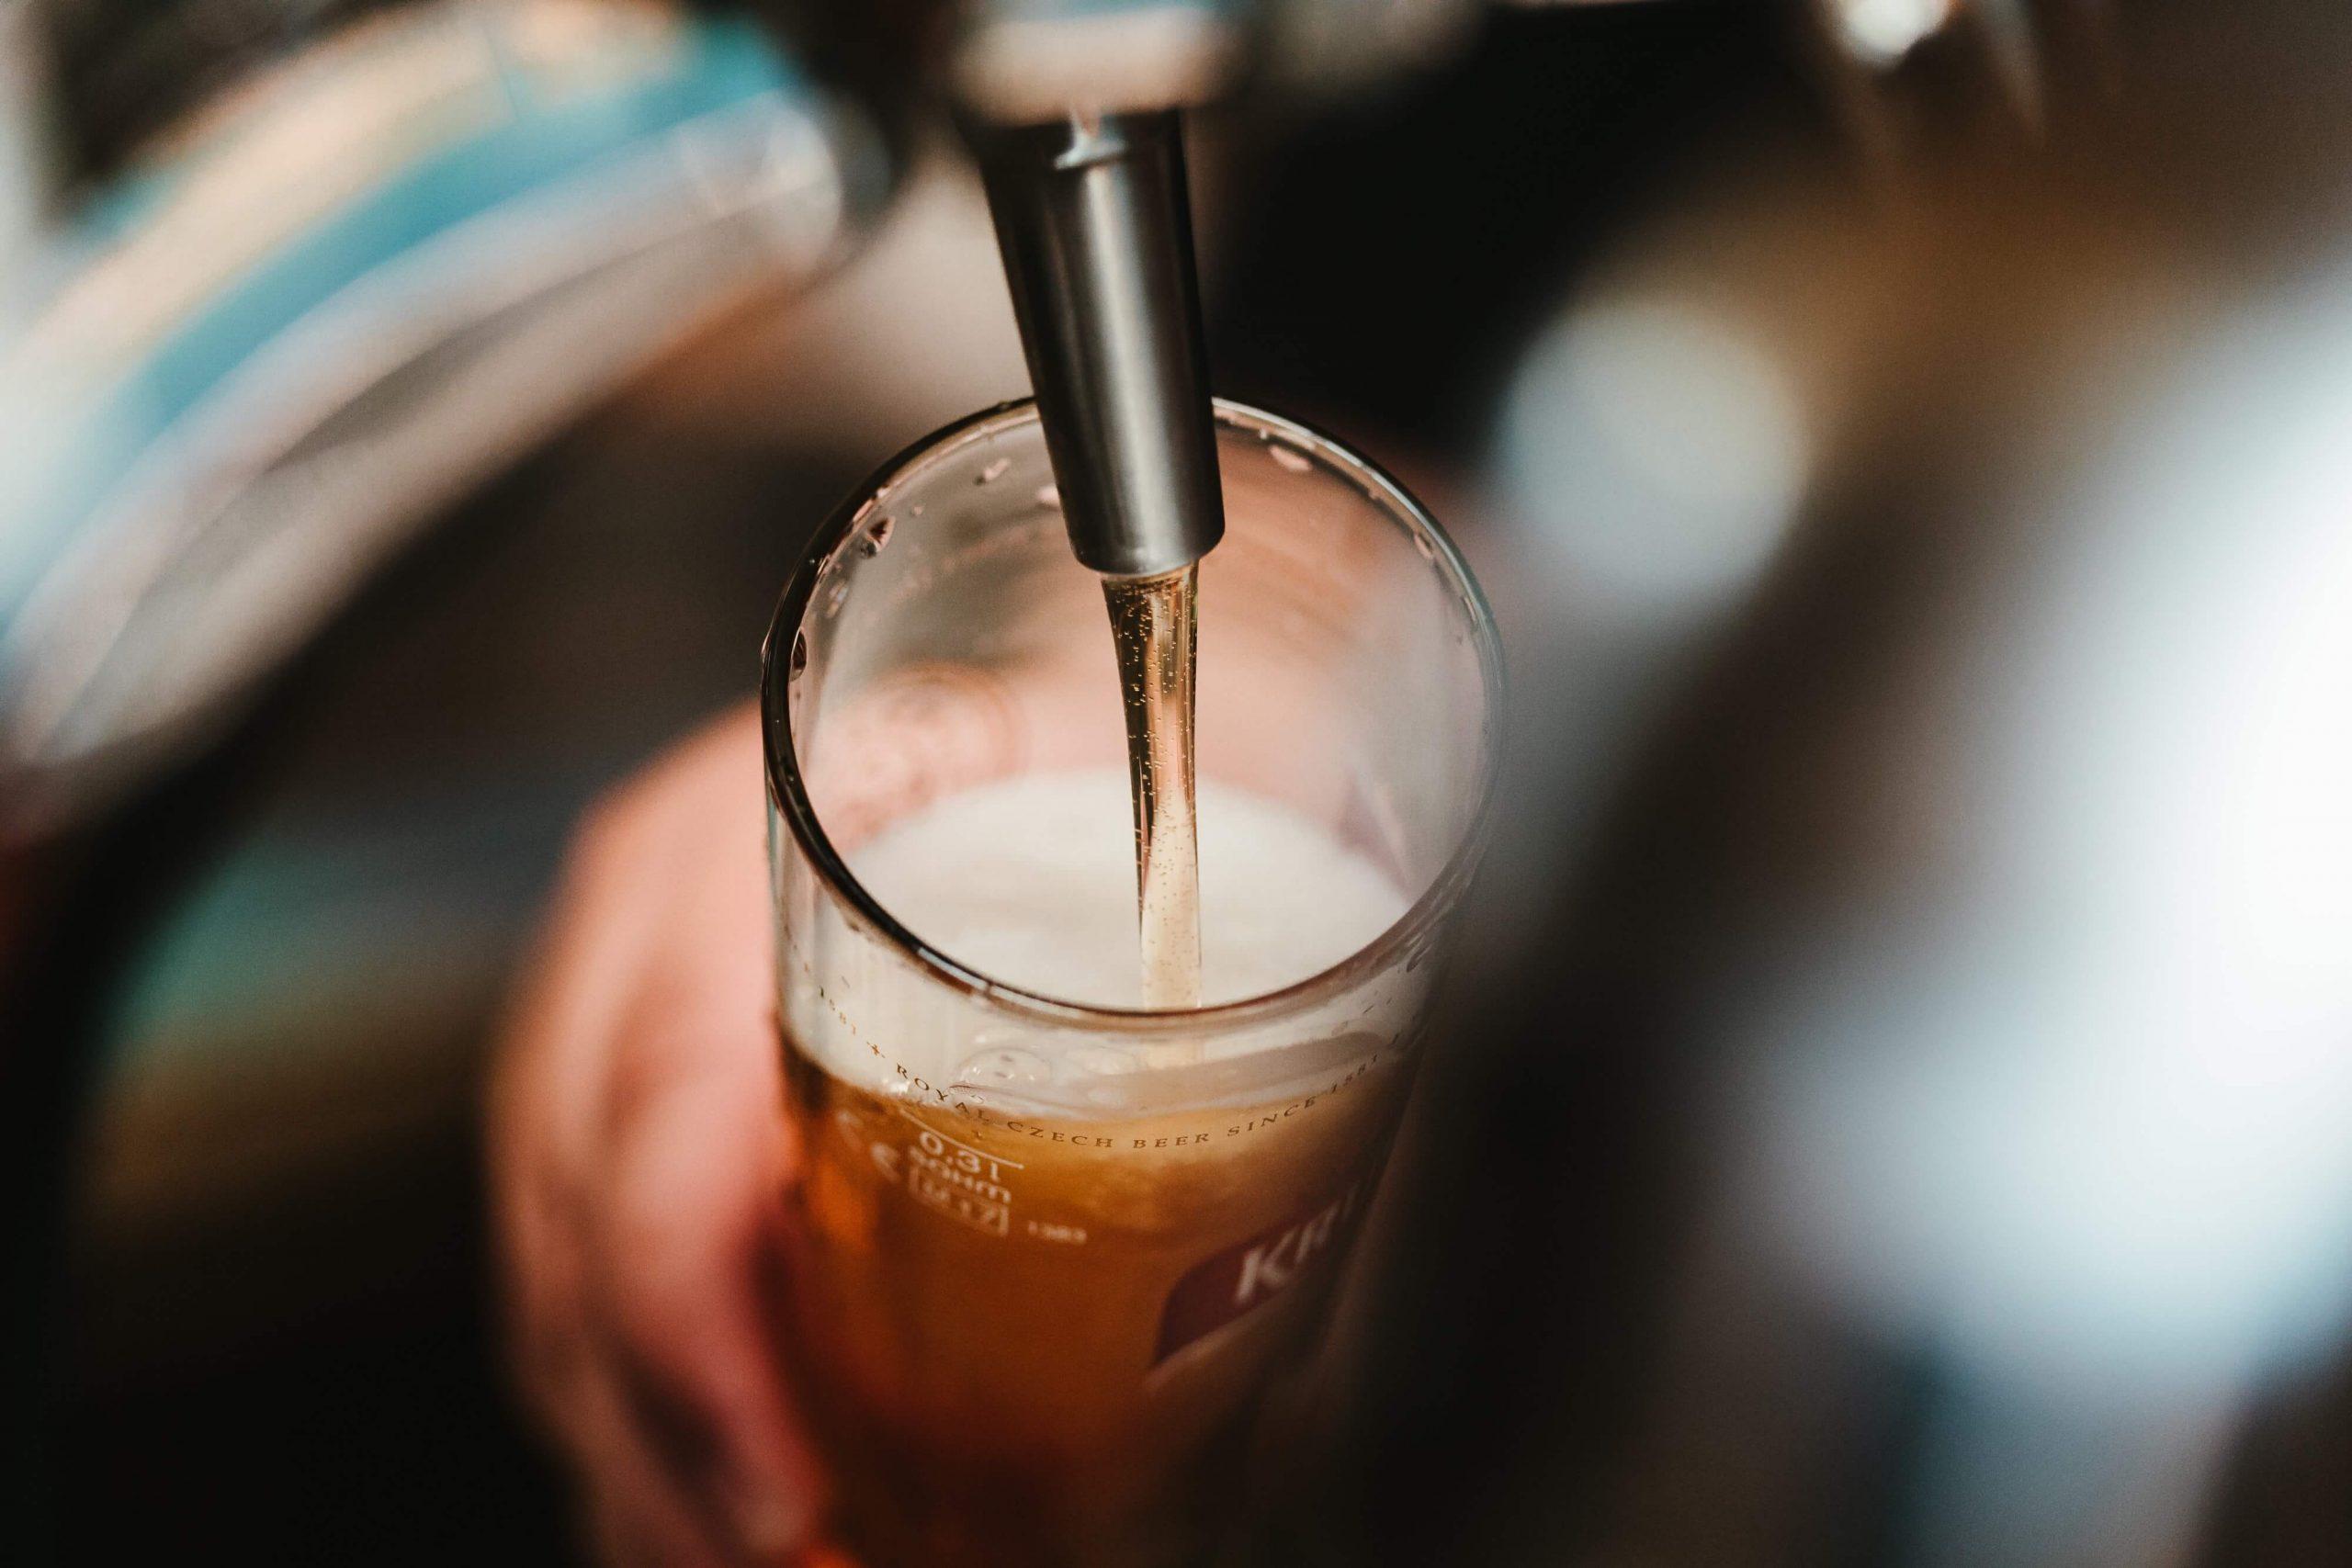 Beer by Bence Boros via Unsplash